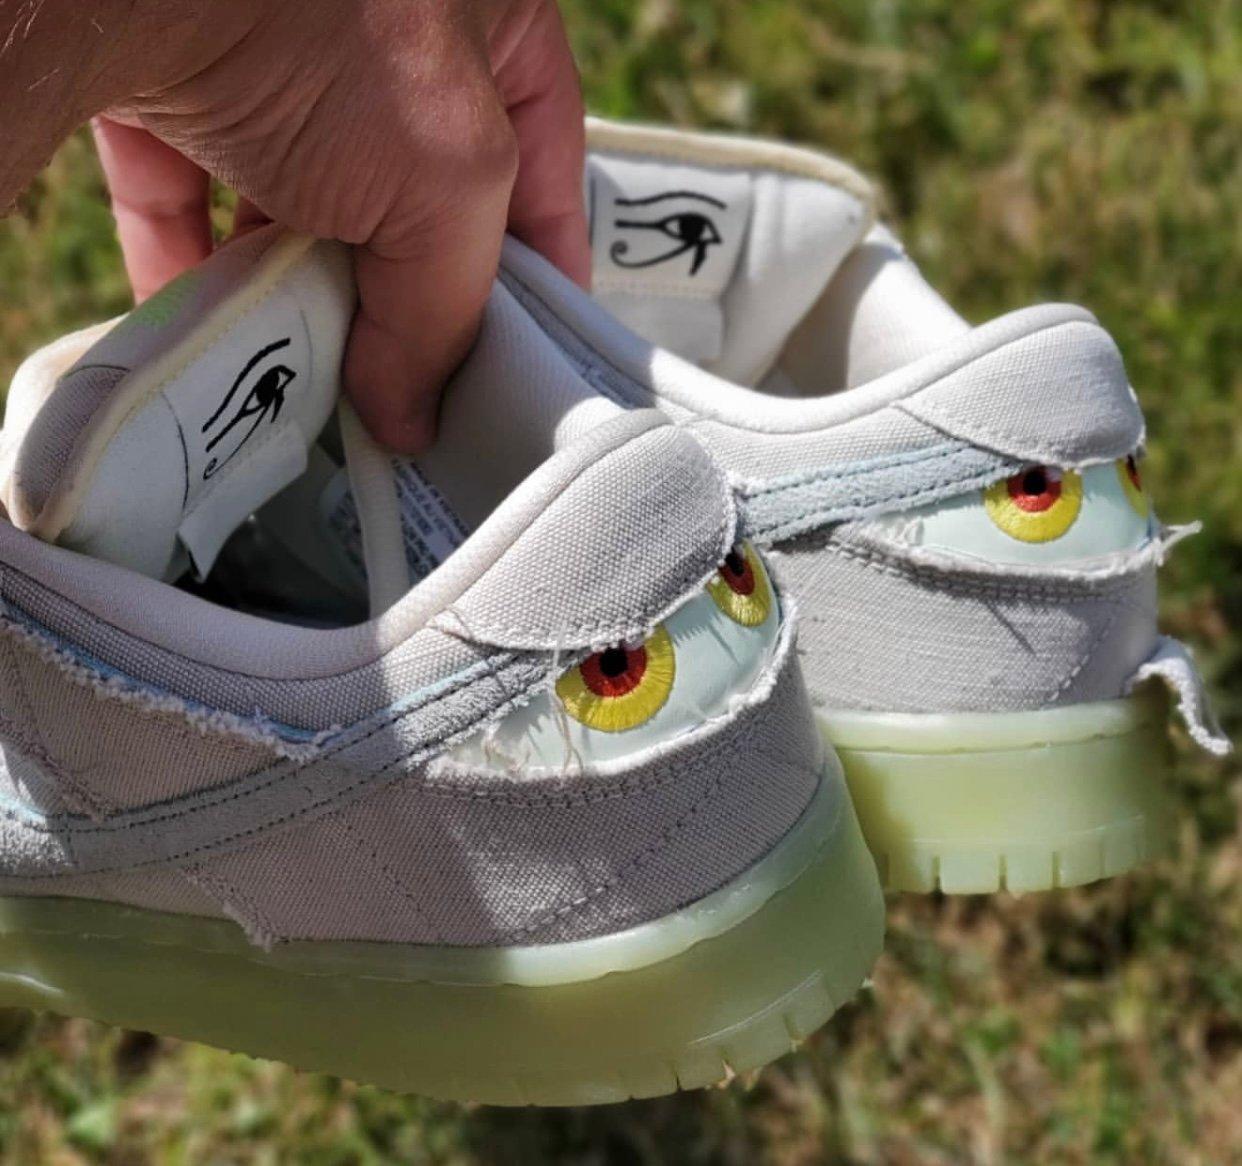 Nike SB Dunk Low Mummy DM0774-111 Release Date